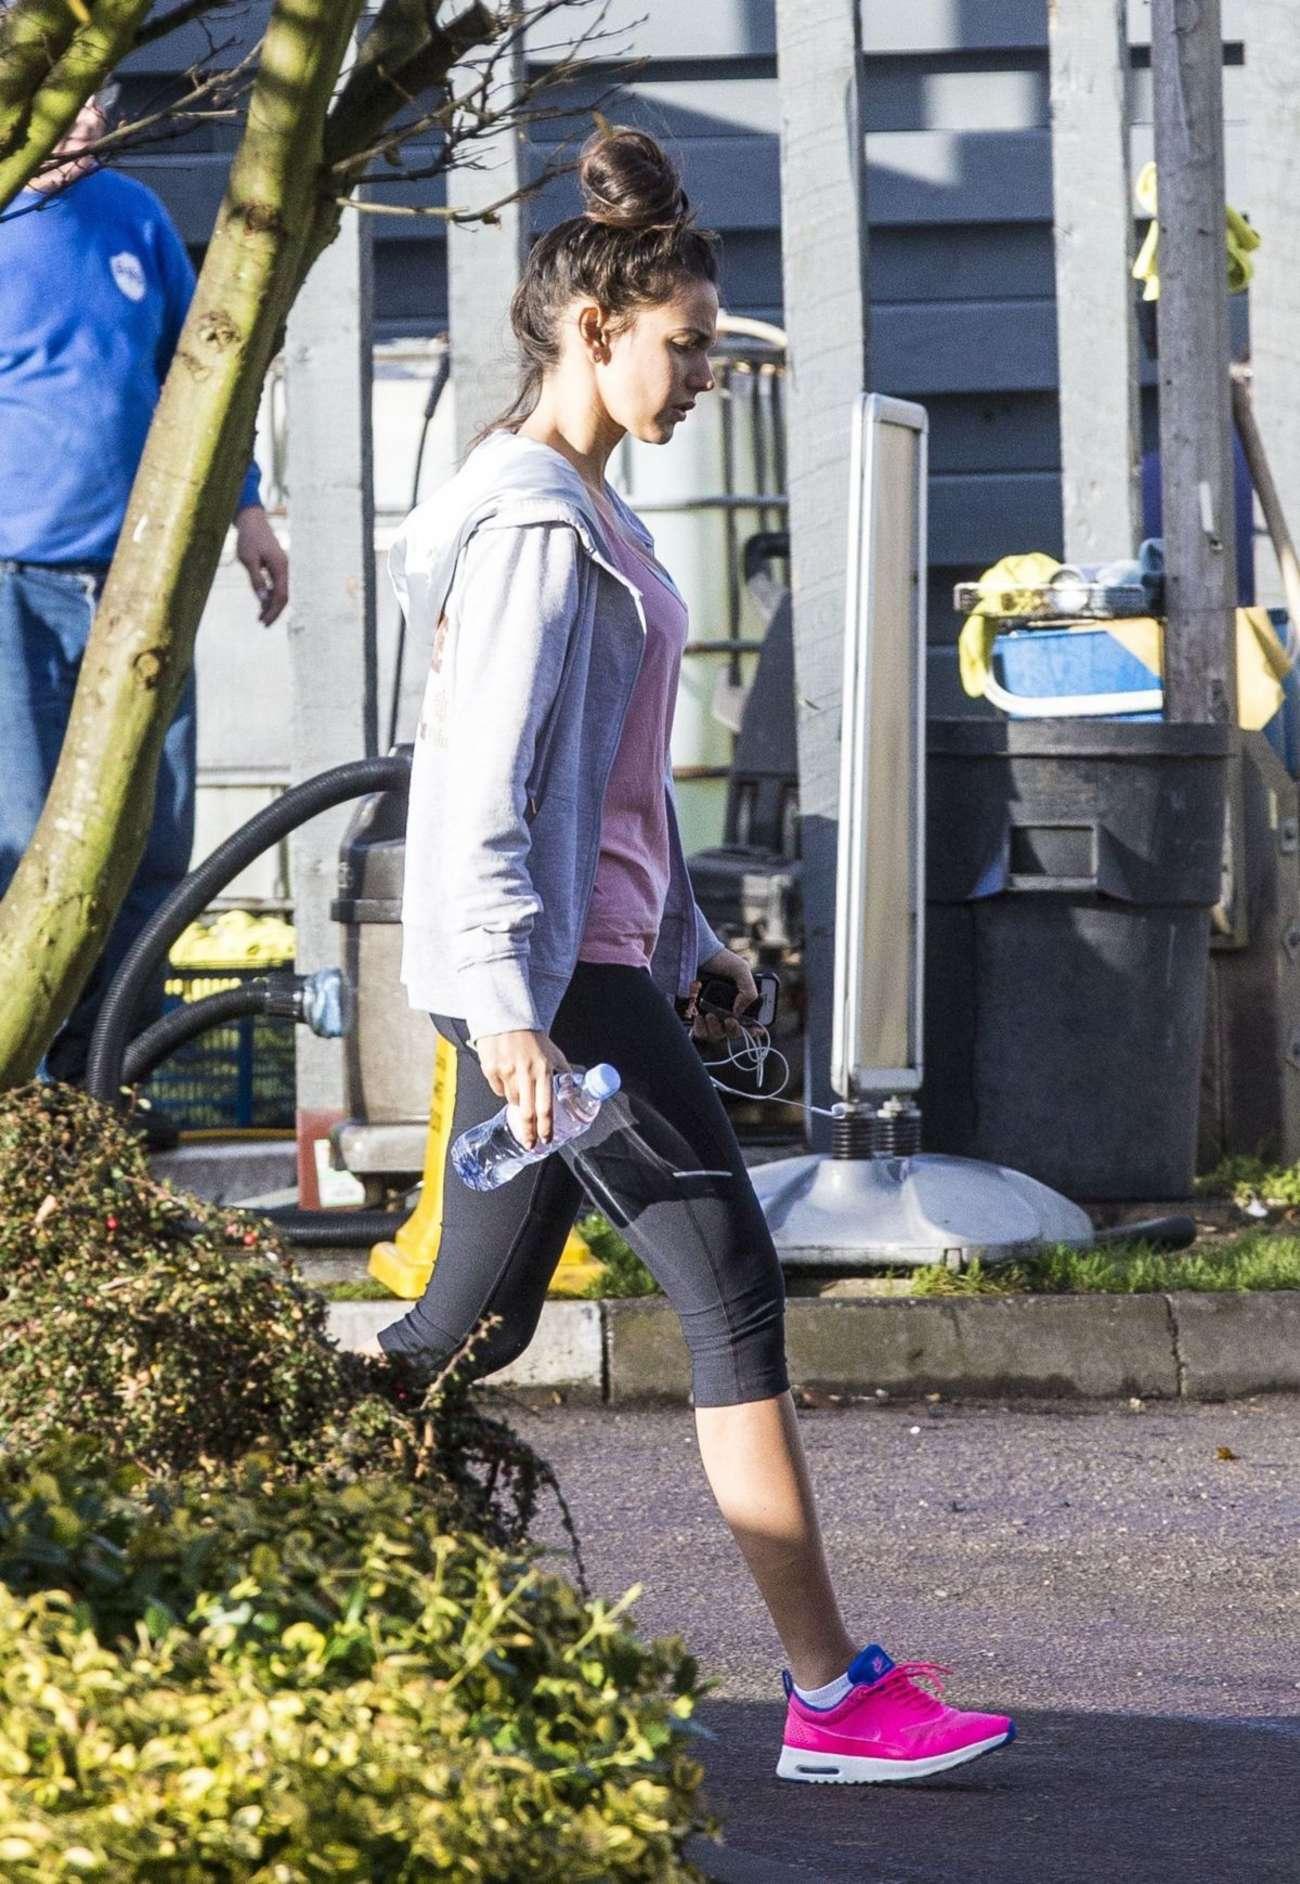 d921e6e5b19a9 Michelle Keegan in Tight Leggings -24 – GotCeleb